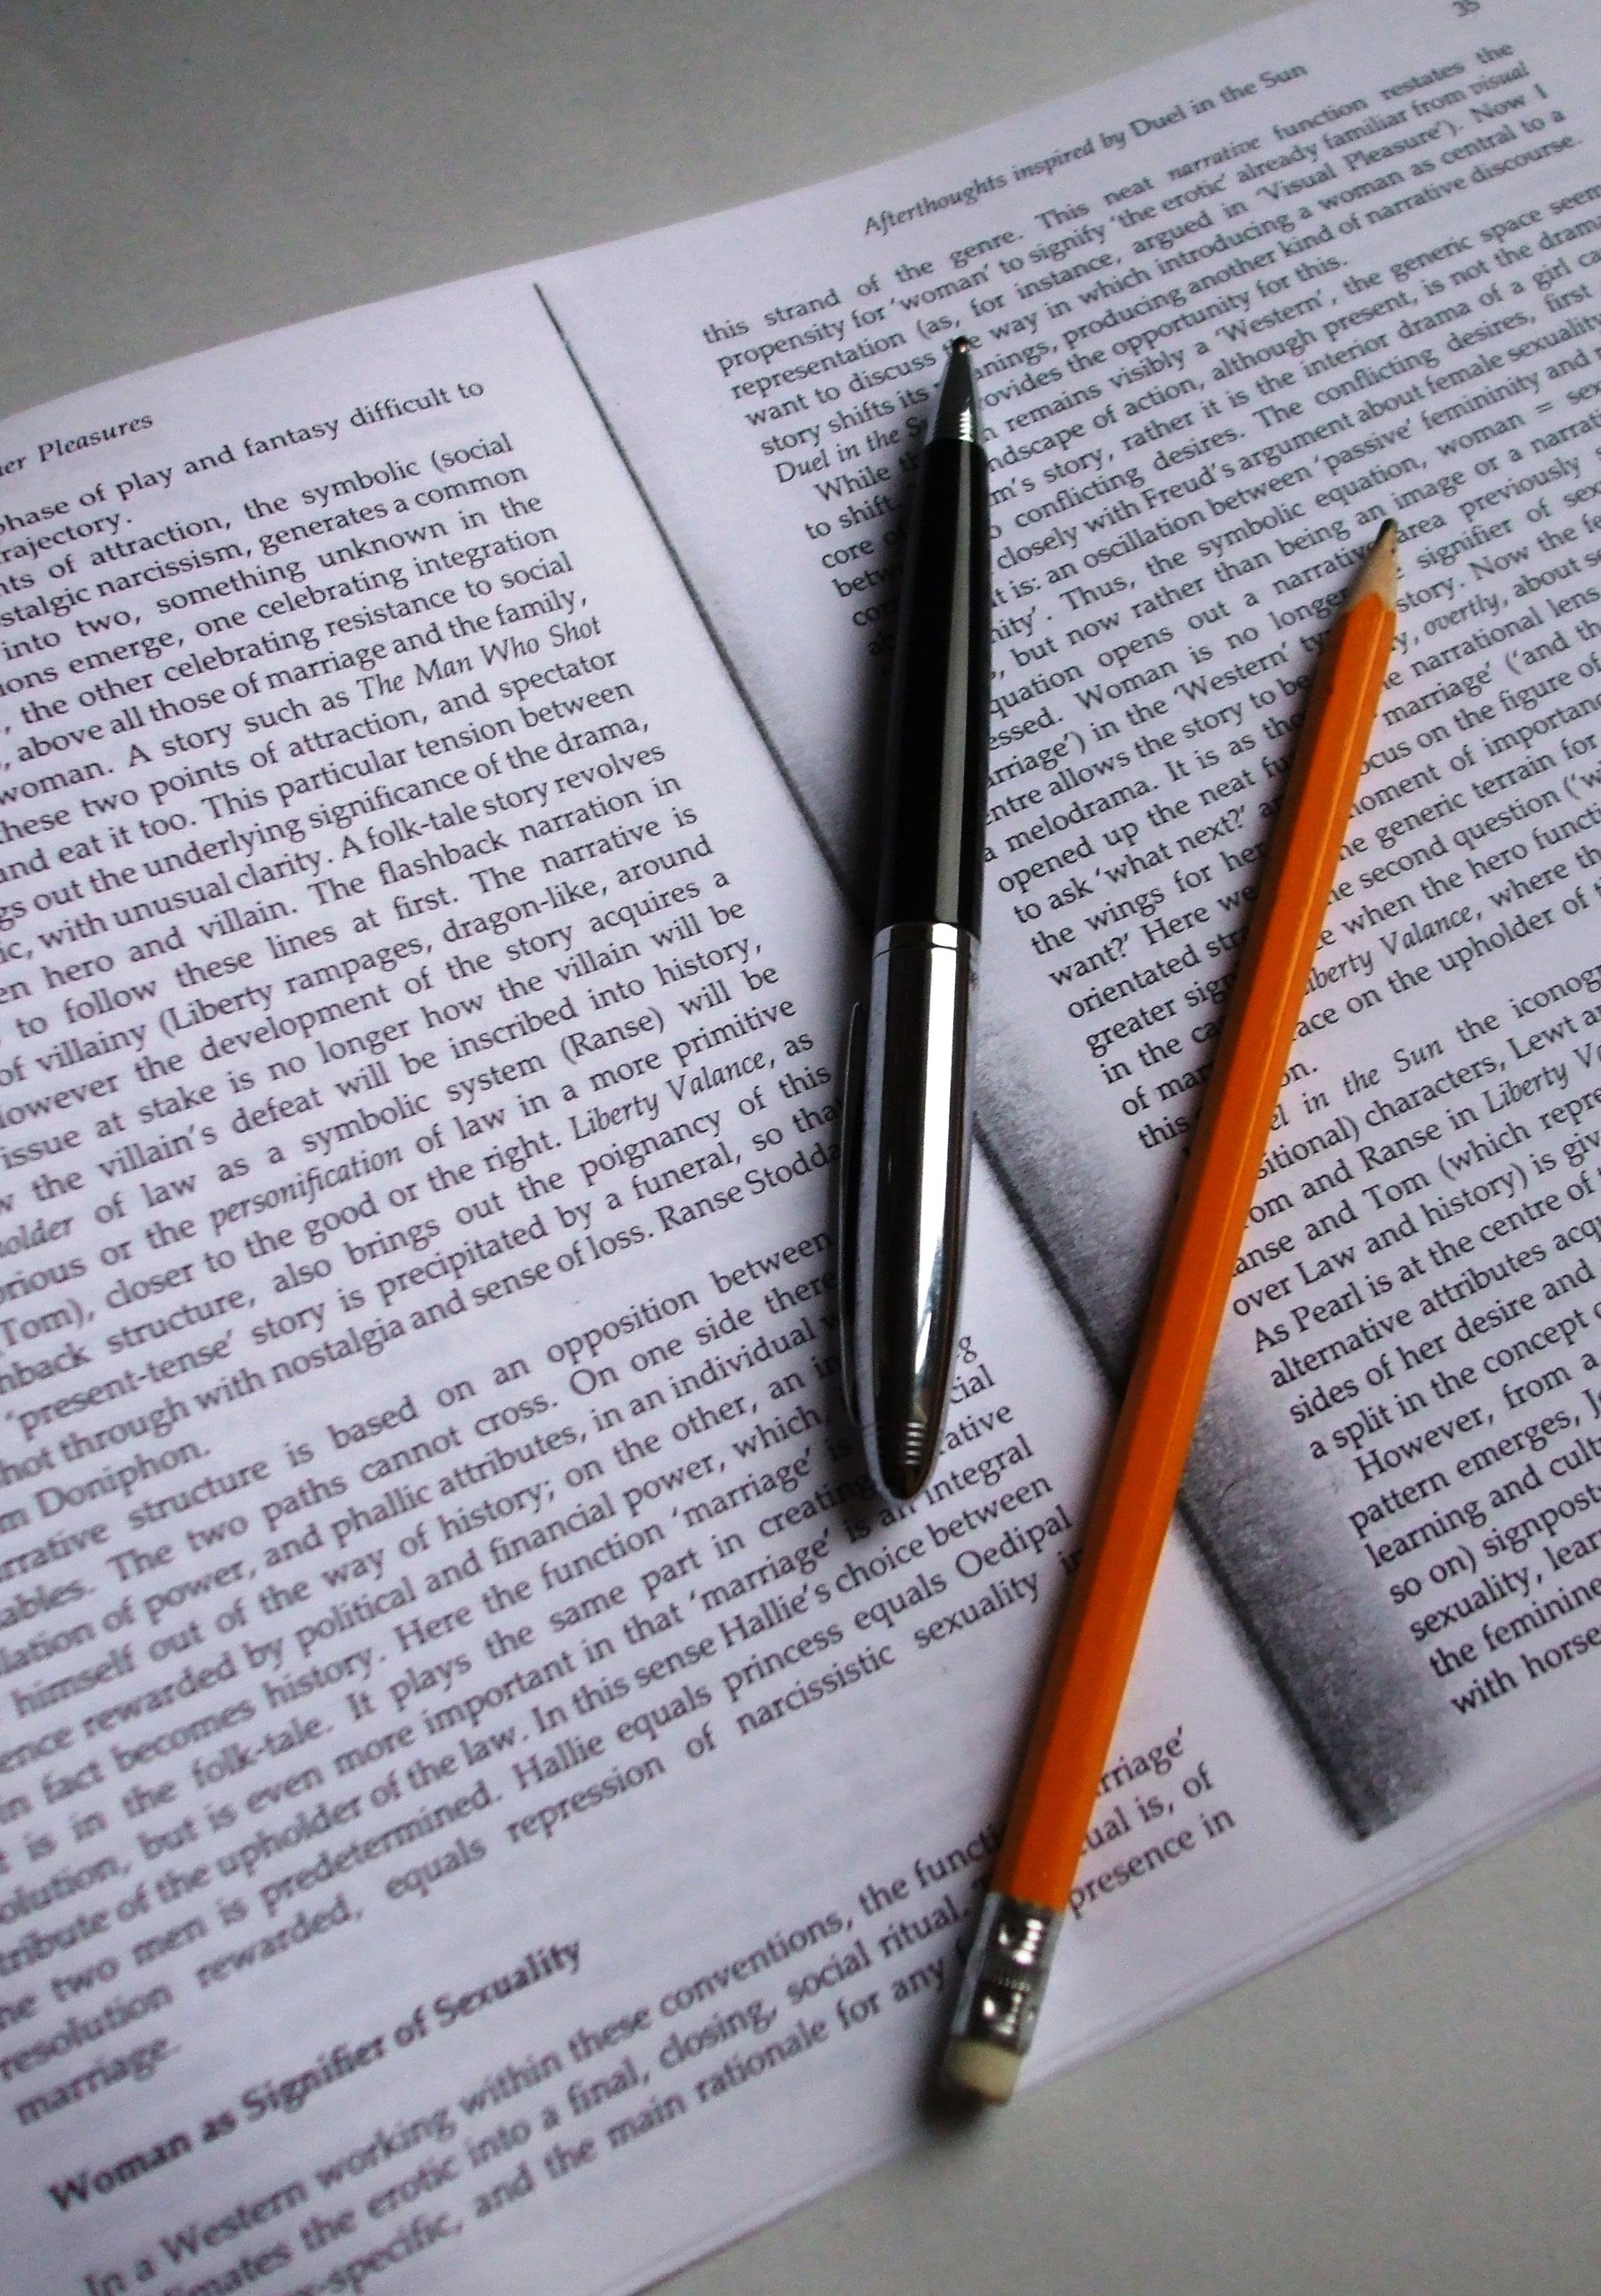 Writting tips